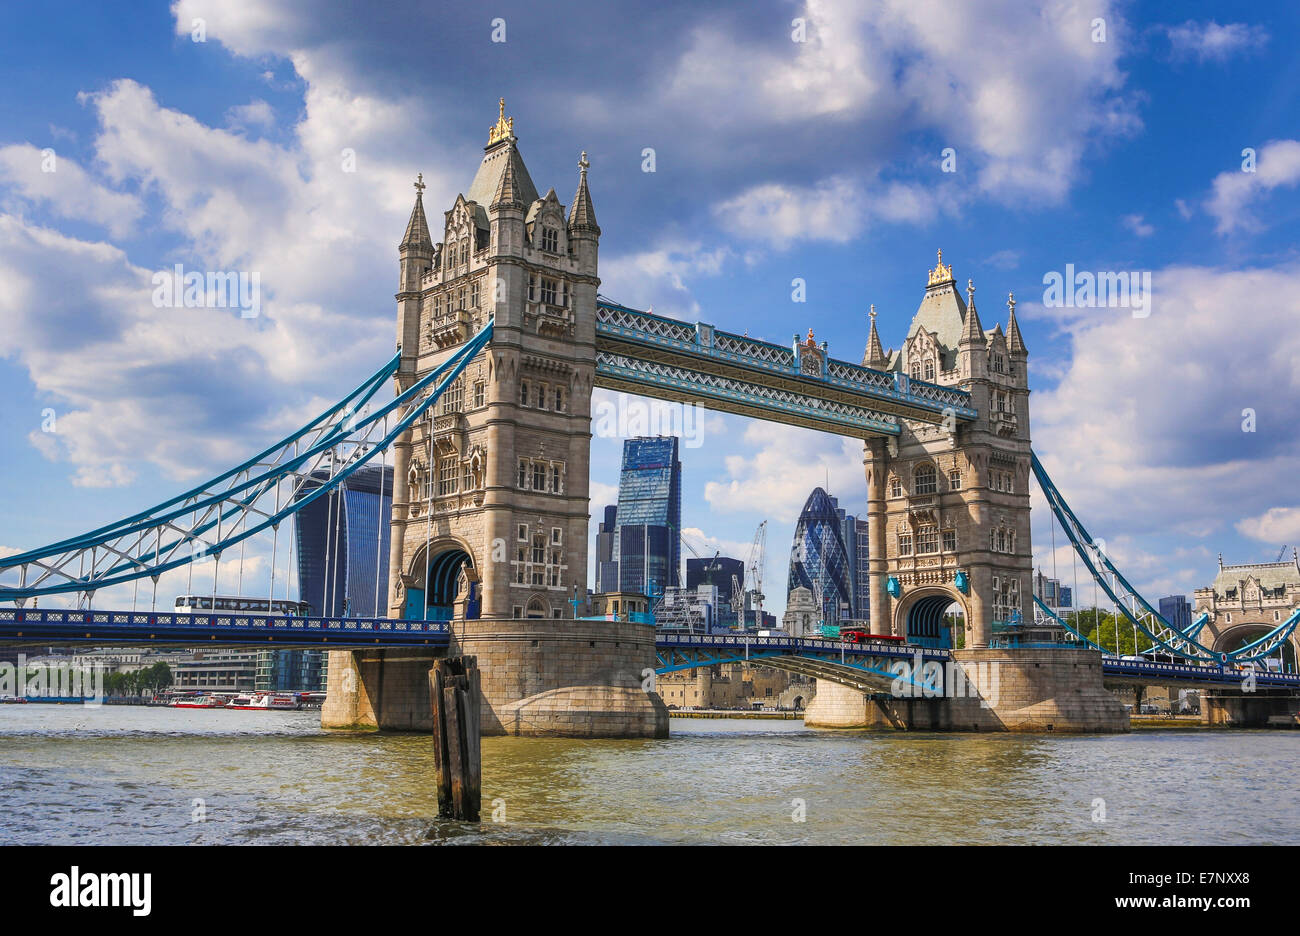 Stadt, London, England, UK, Architektur, Brücke, berühmte, Skyline, Themse, Fluss, Tourismus, Reisen, Stockbild